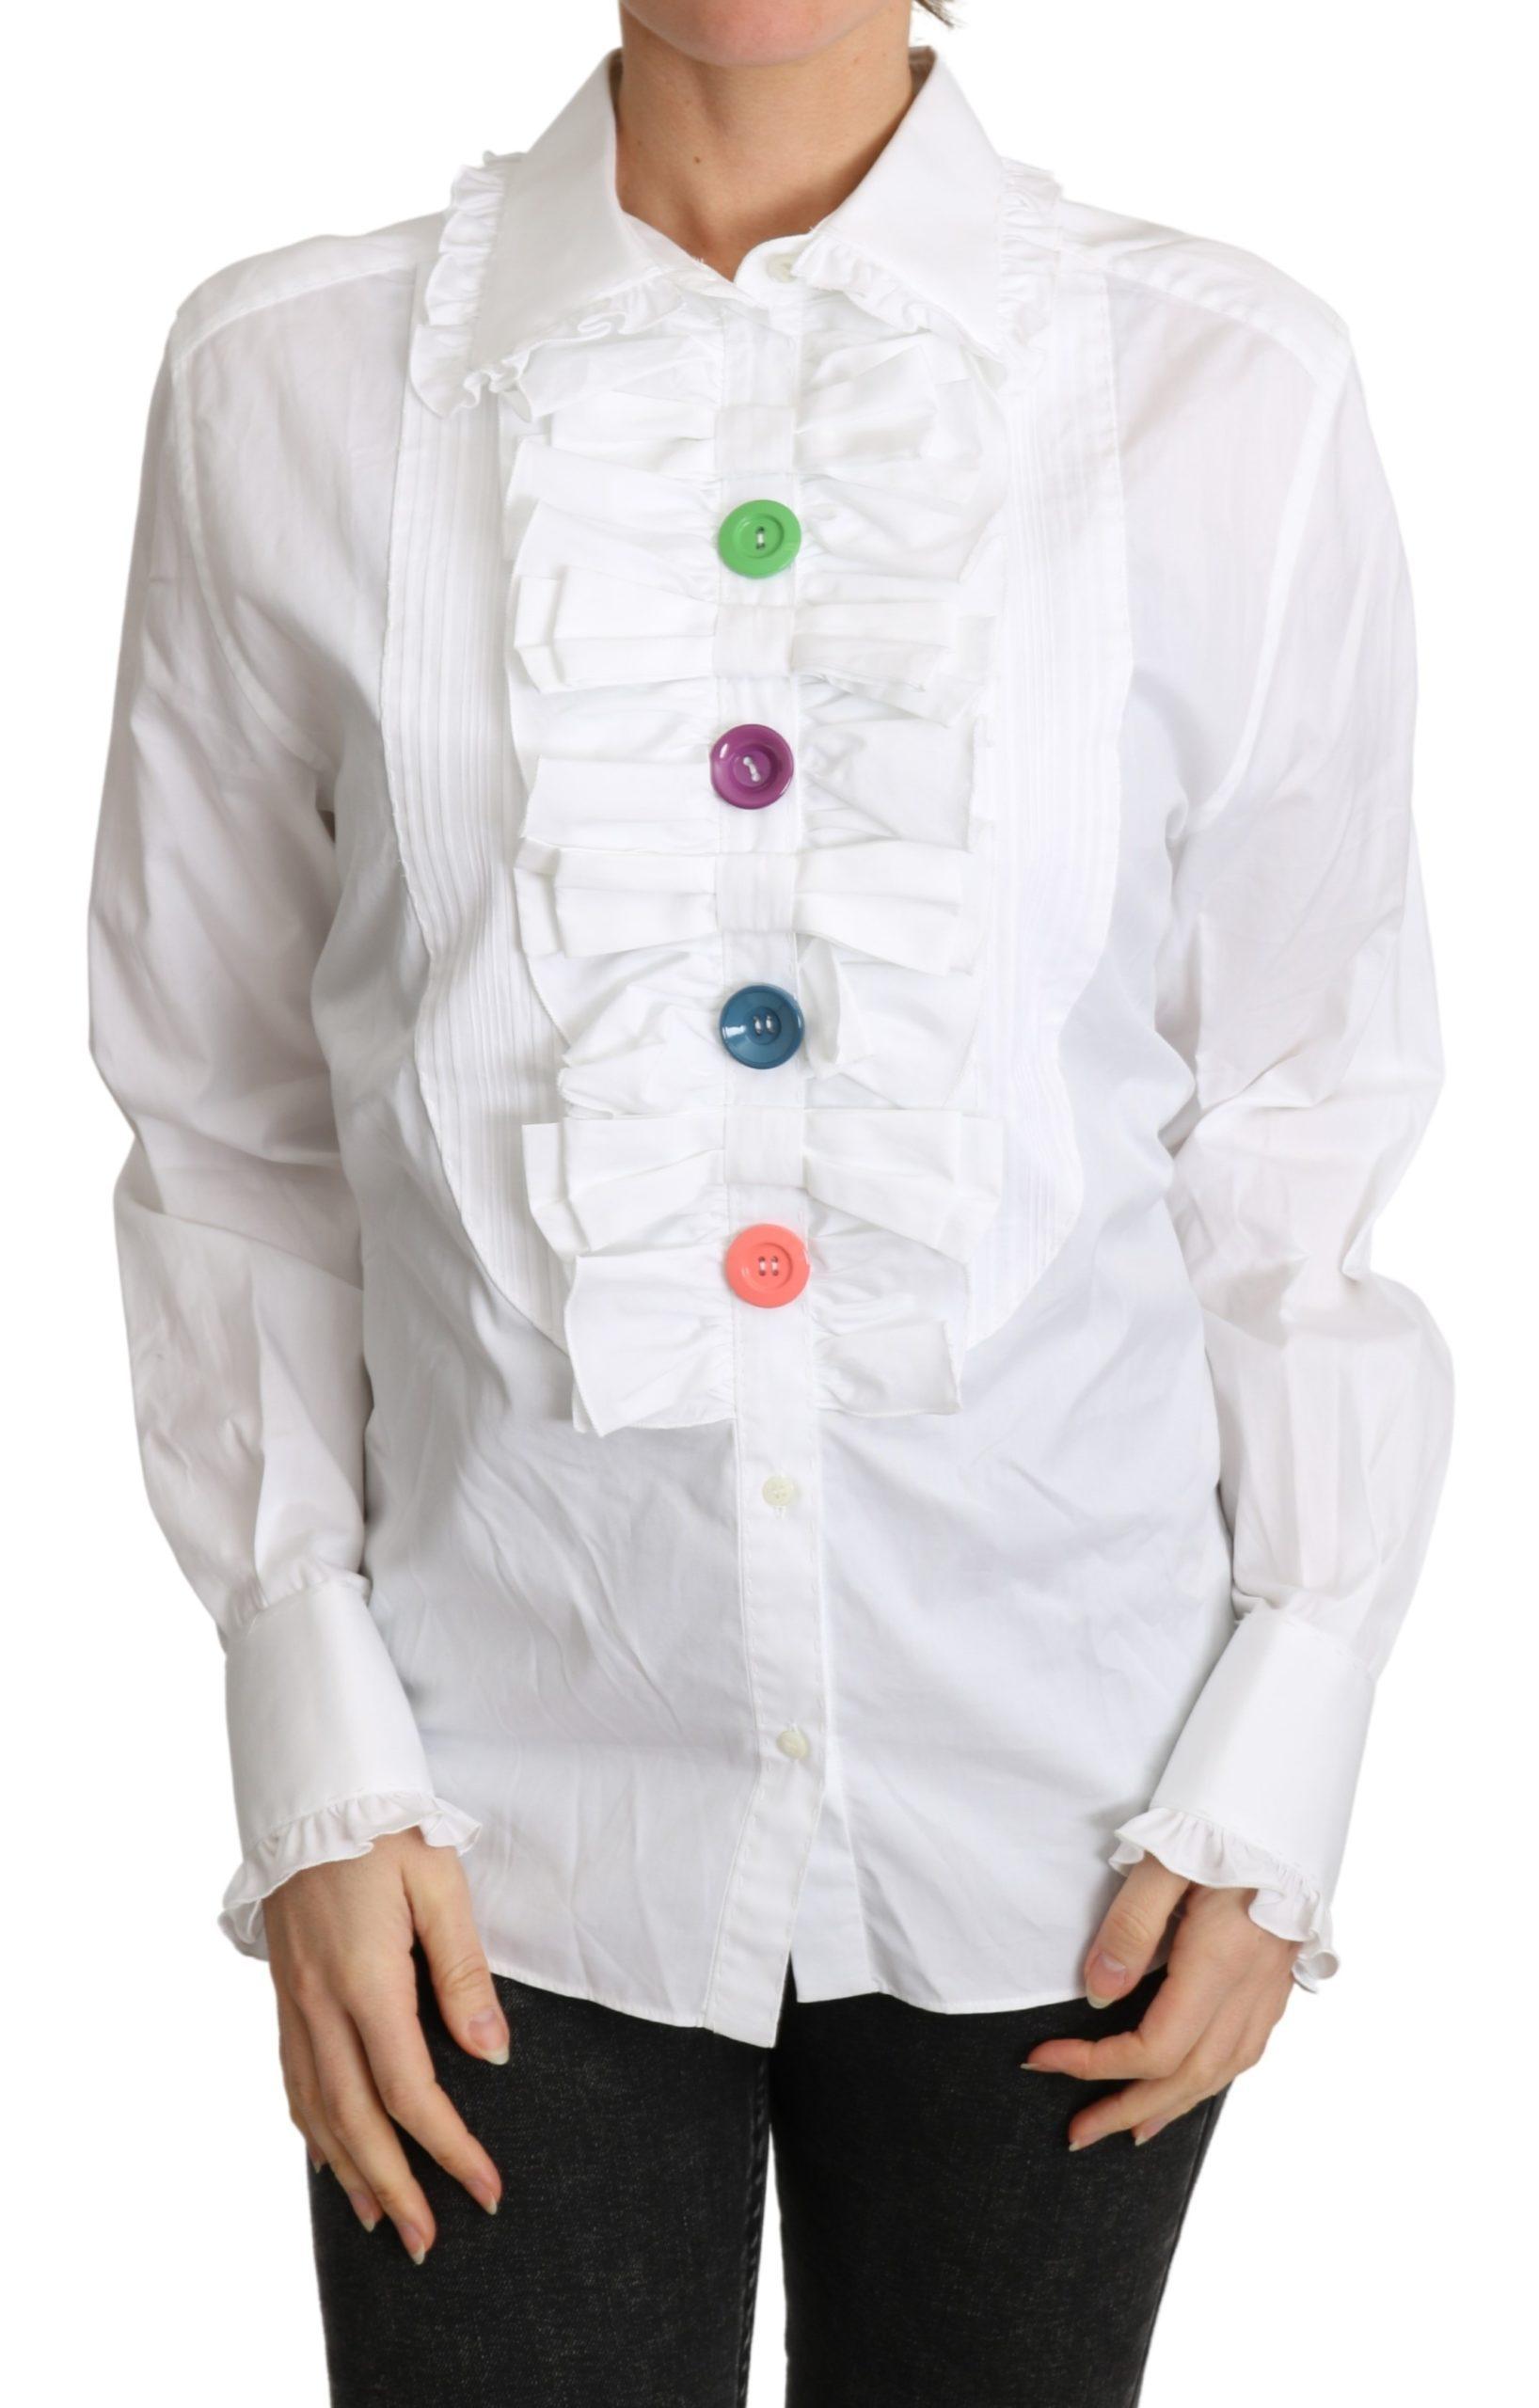 Dolce & Gabbana Women's Ruffle Long Sleeves Top White TSH4832 - IT46|XL